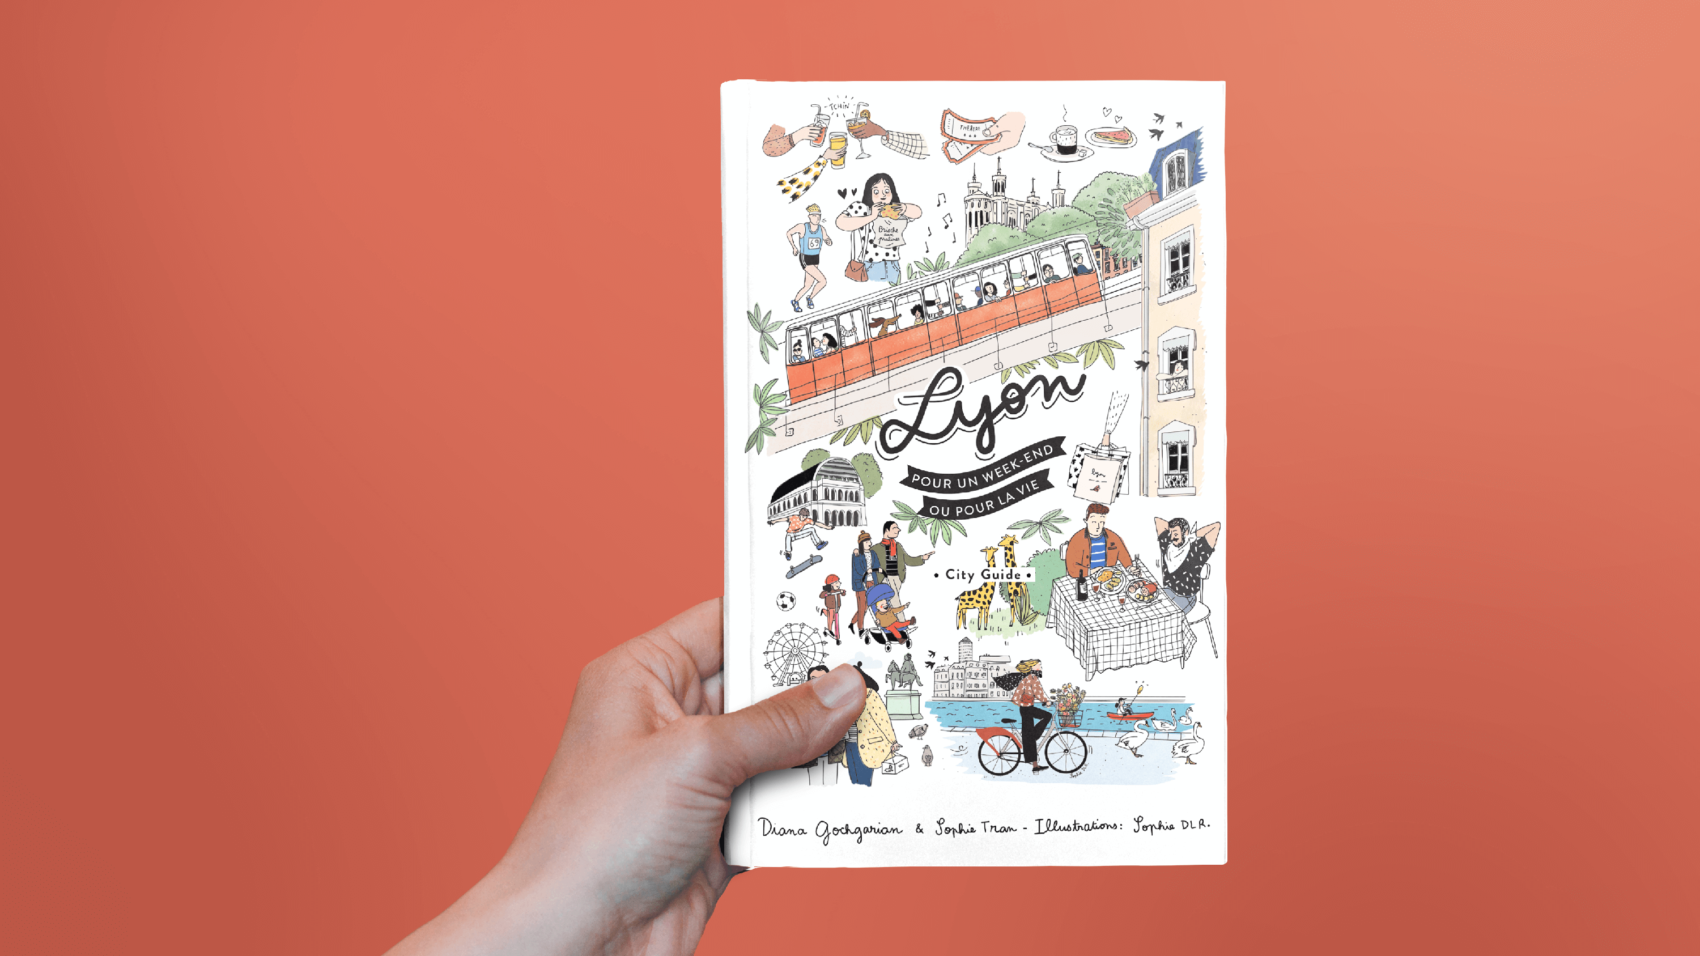 Lyon city guide 2